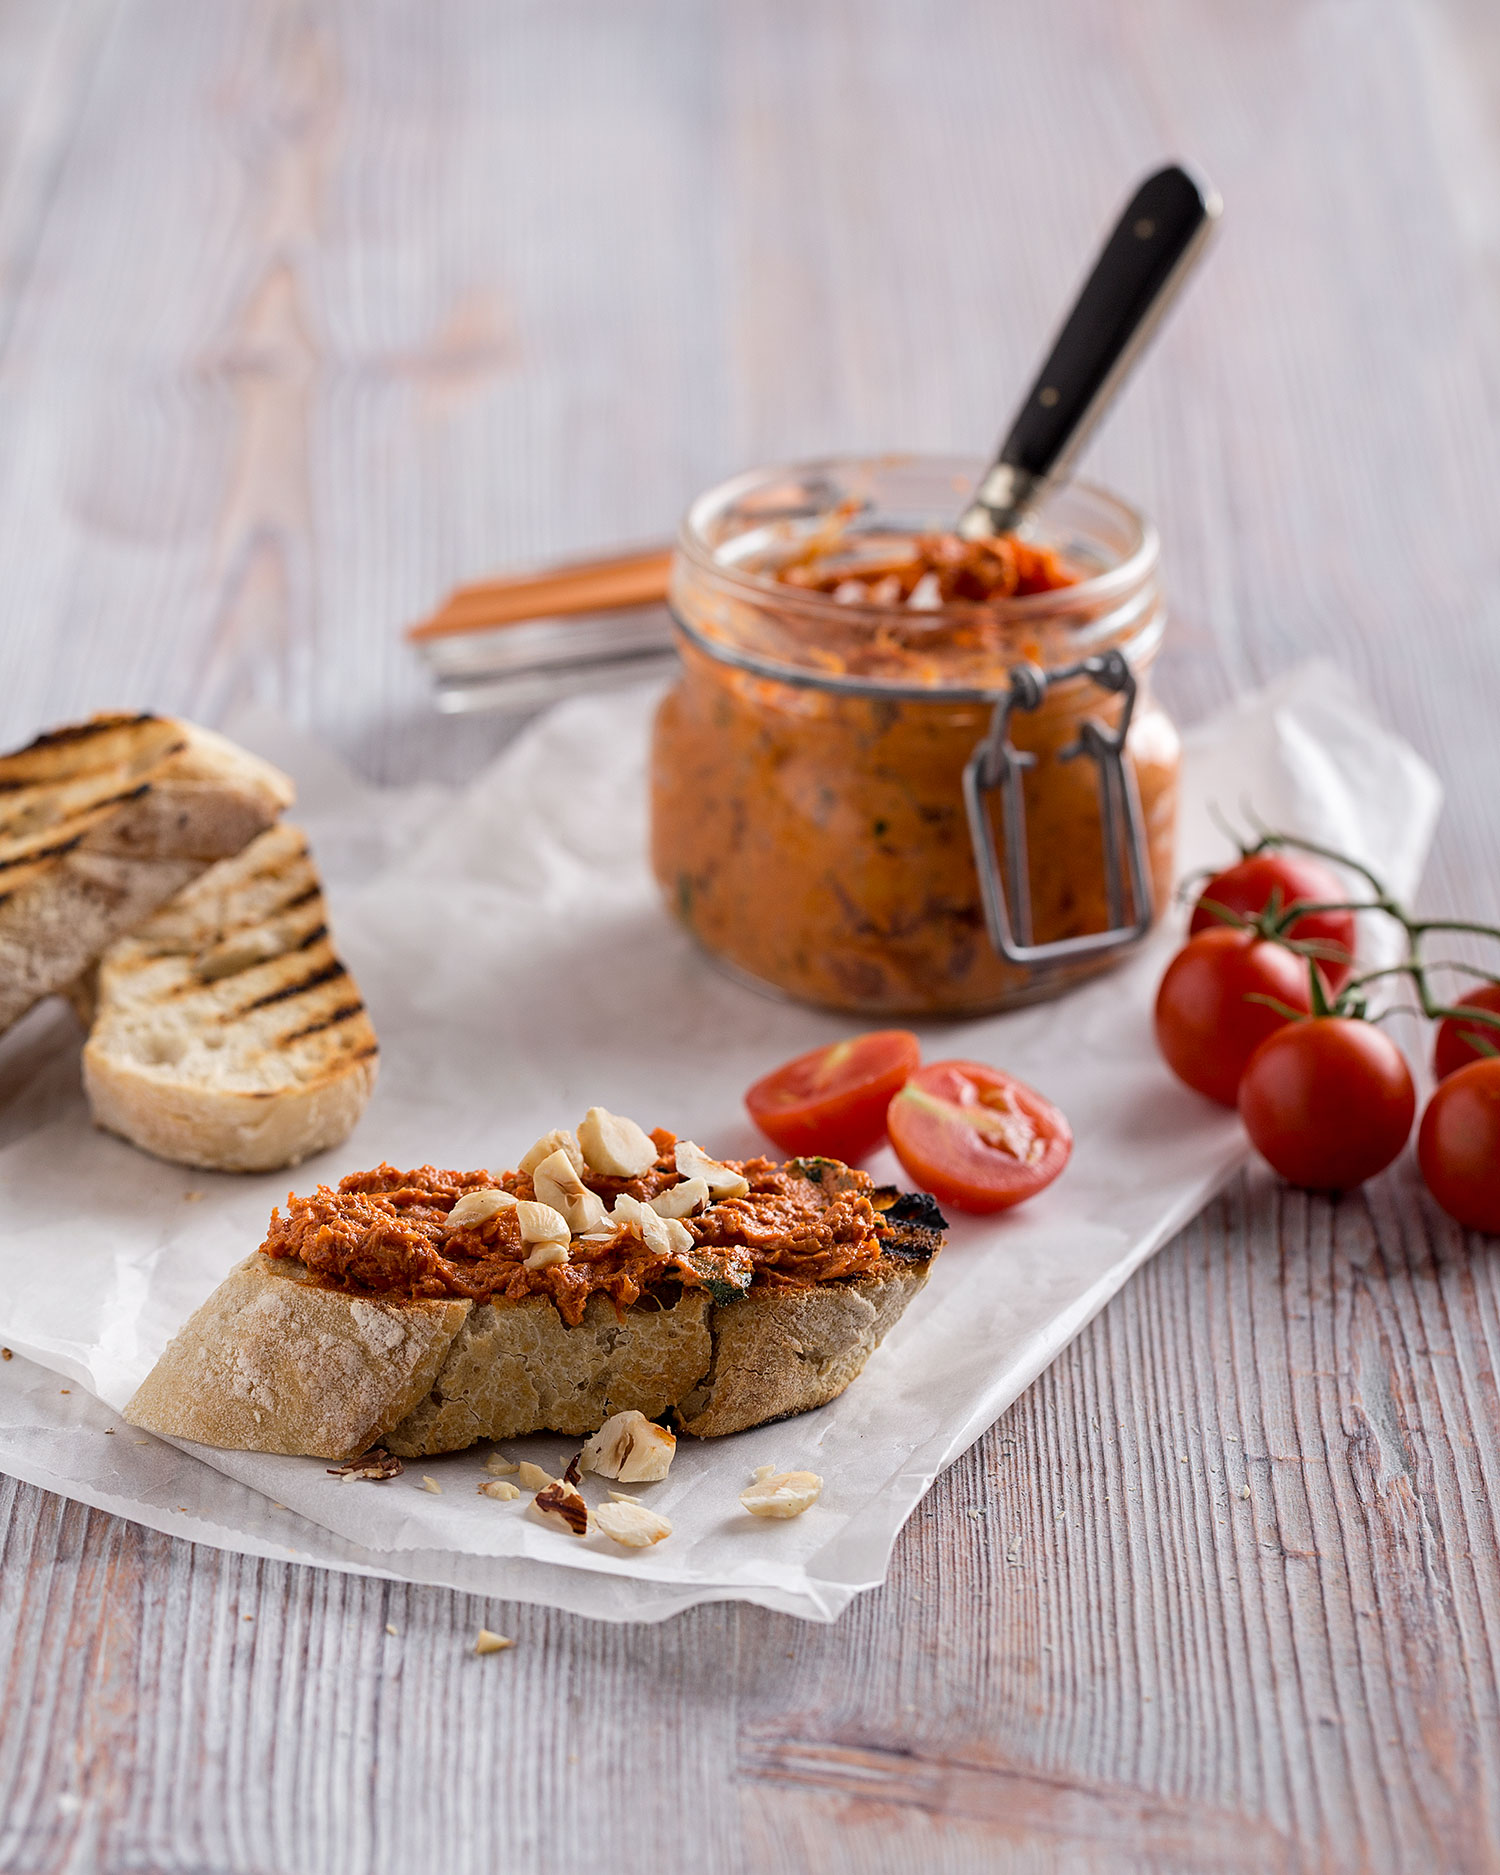 corina-landa-food-photography-fotografia-gastronomica-14.jpg